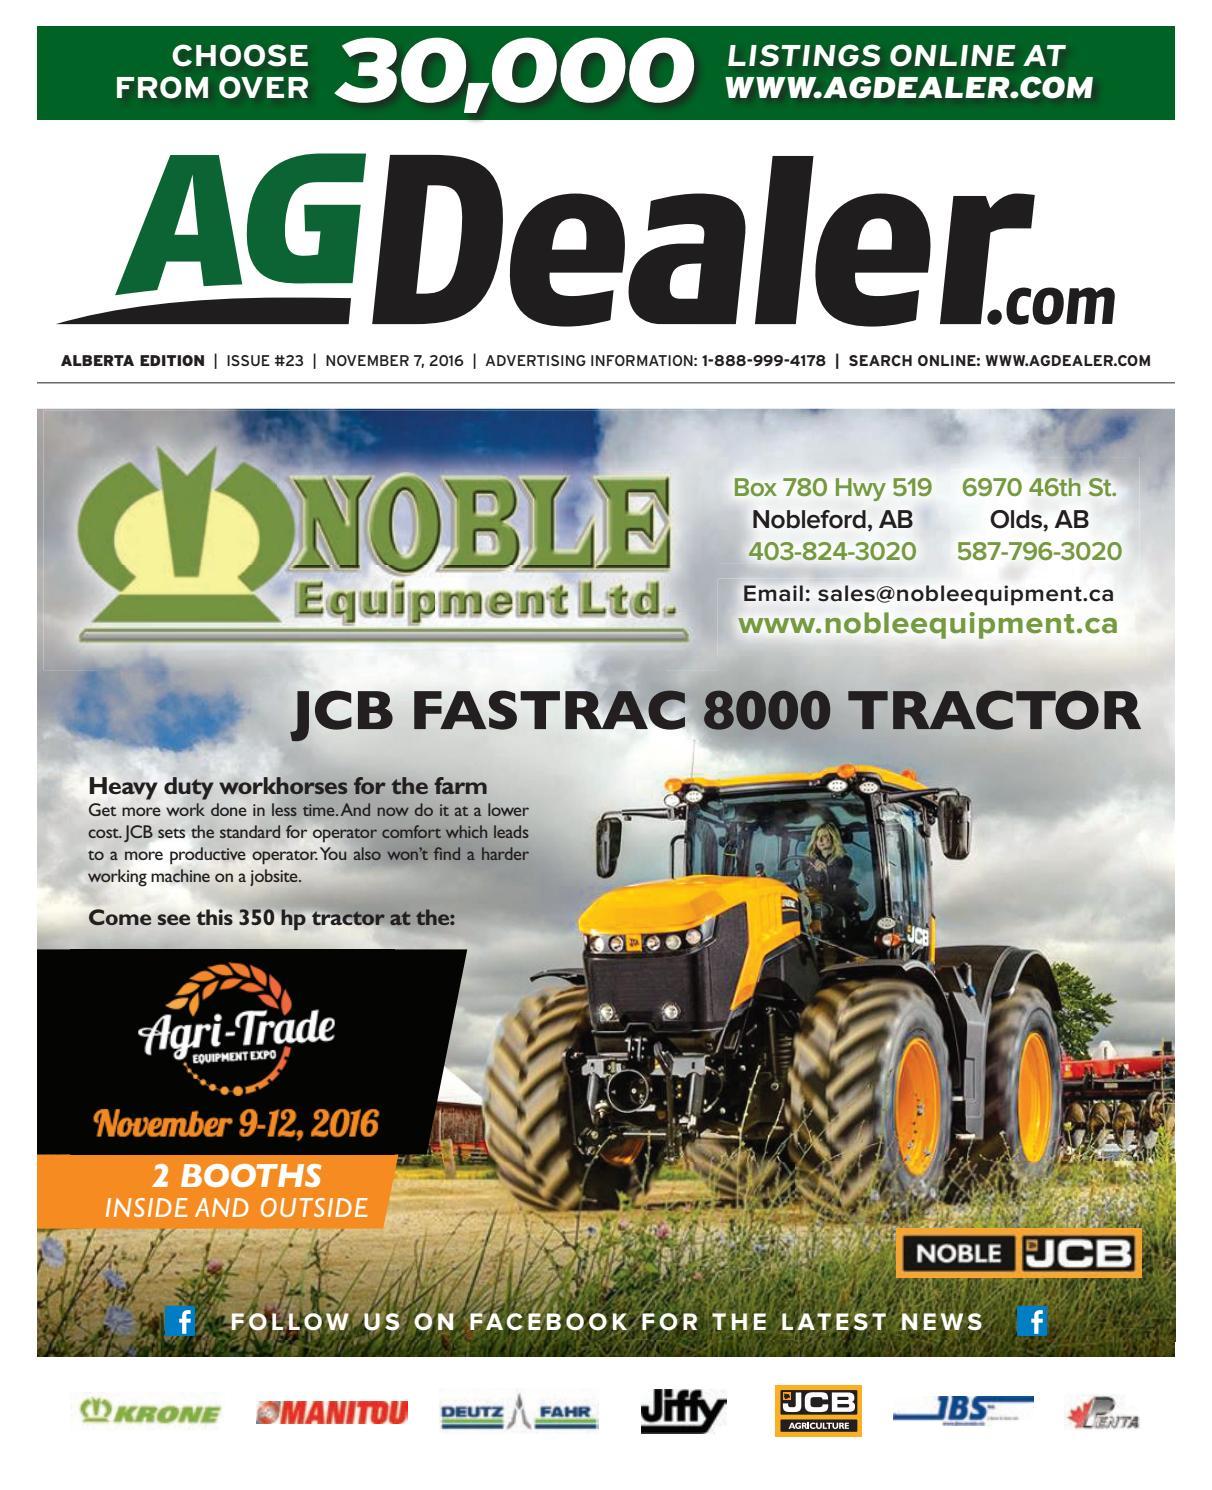 Wheel & Deal Alberta, November 7, 2016 by Farm Business Communications  - issuu